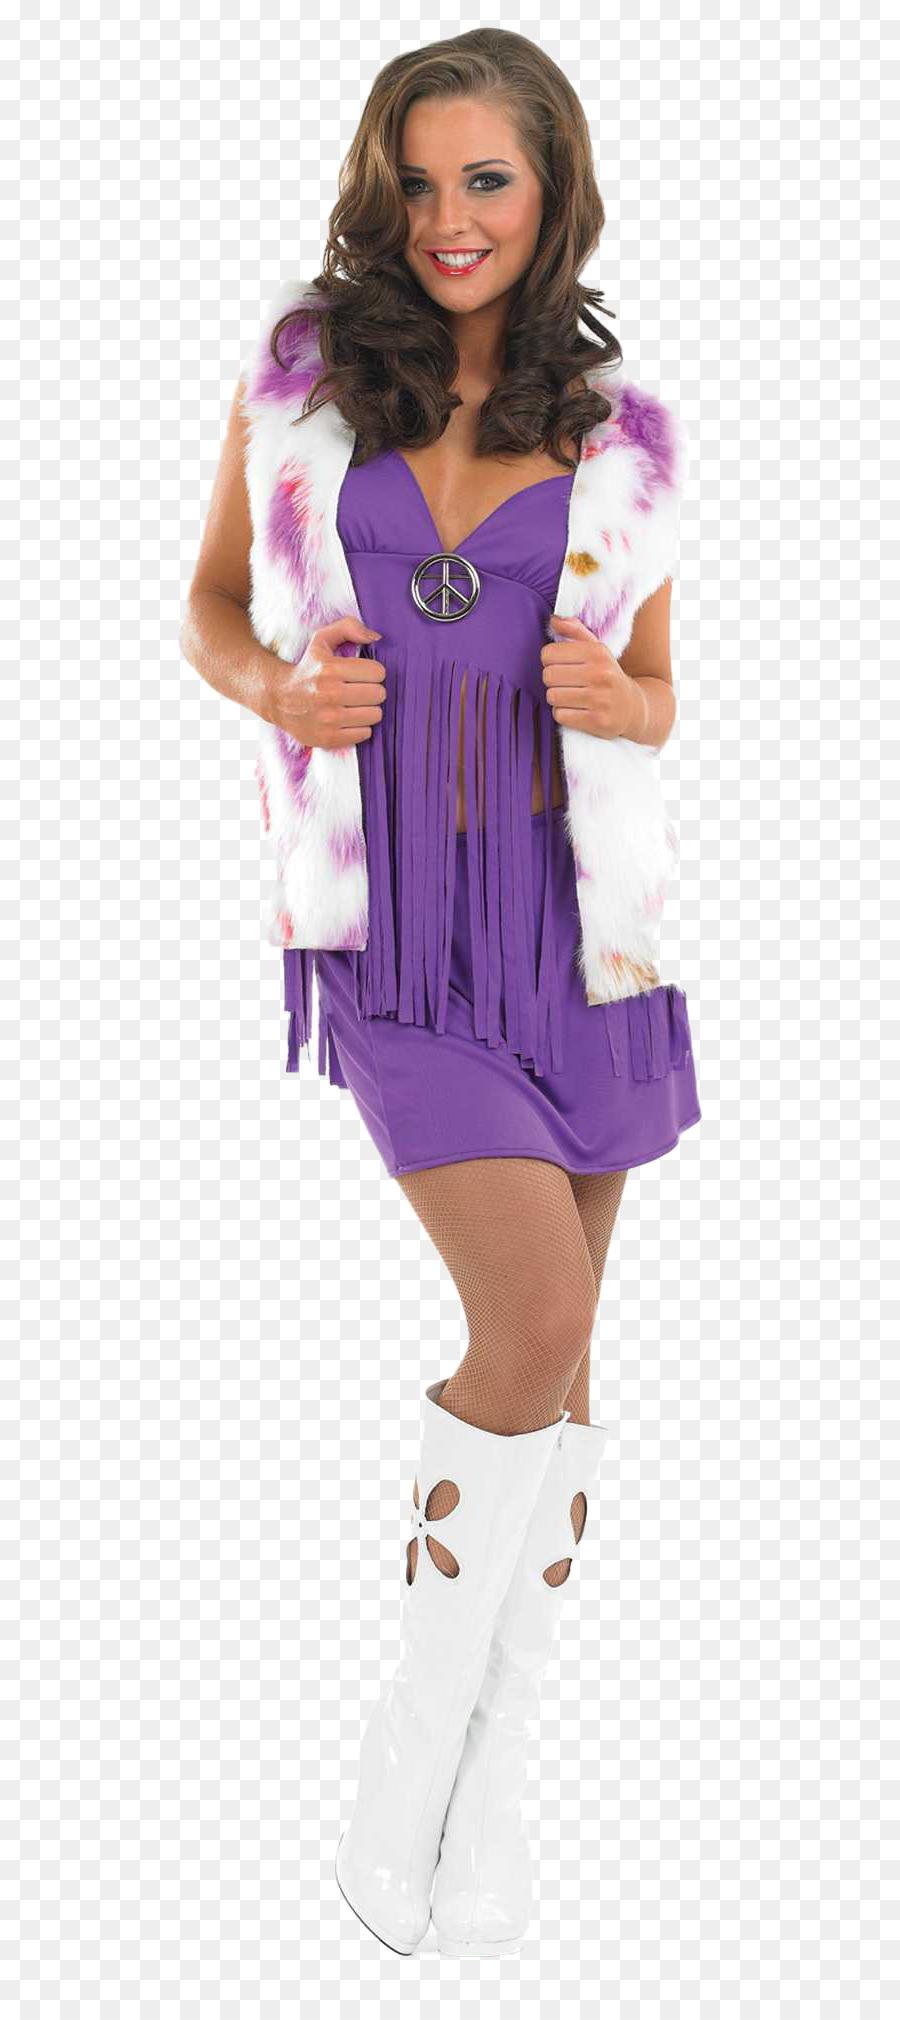 Fiesta de disfraces de la década de 1970 década de 1960 Chaleco ...